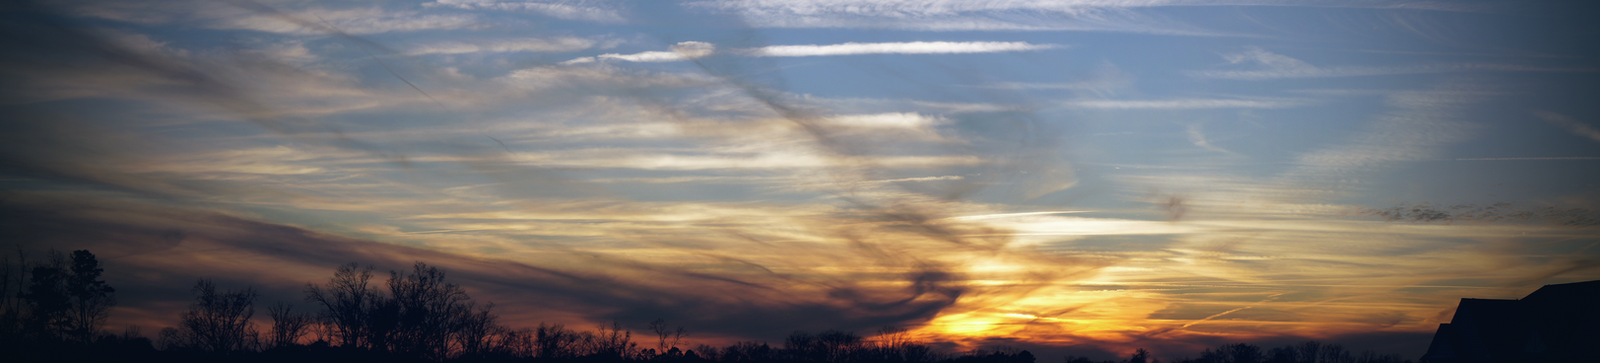 Panoramic Streaks by atLevel1Alt